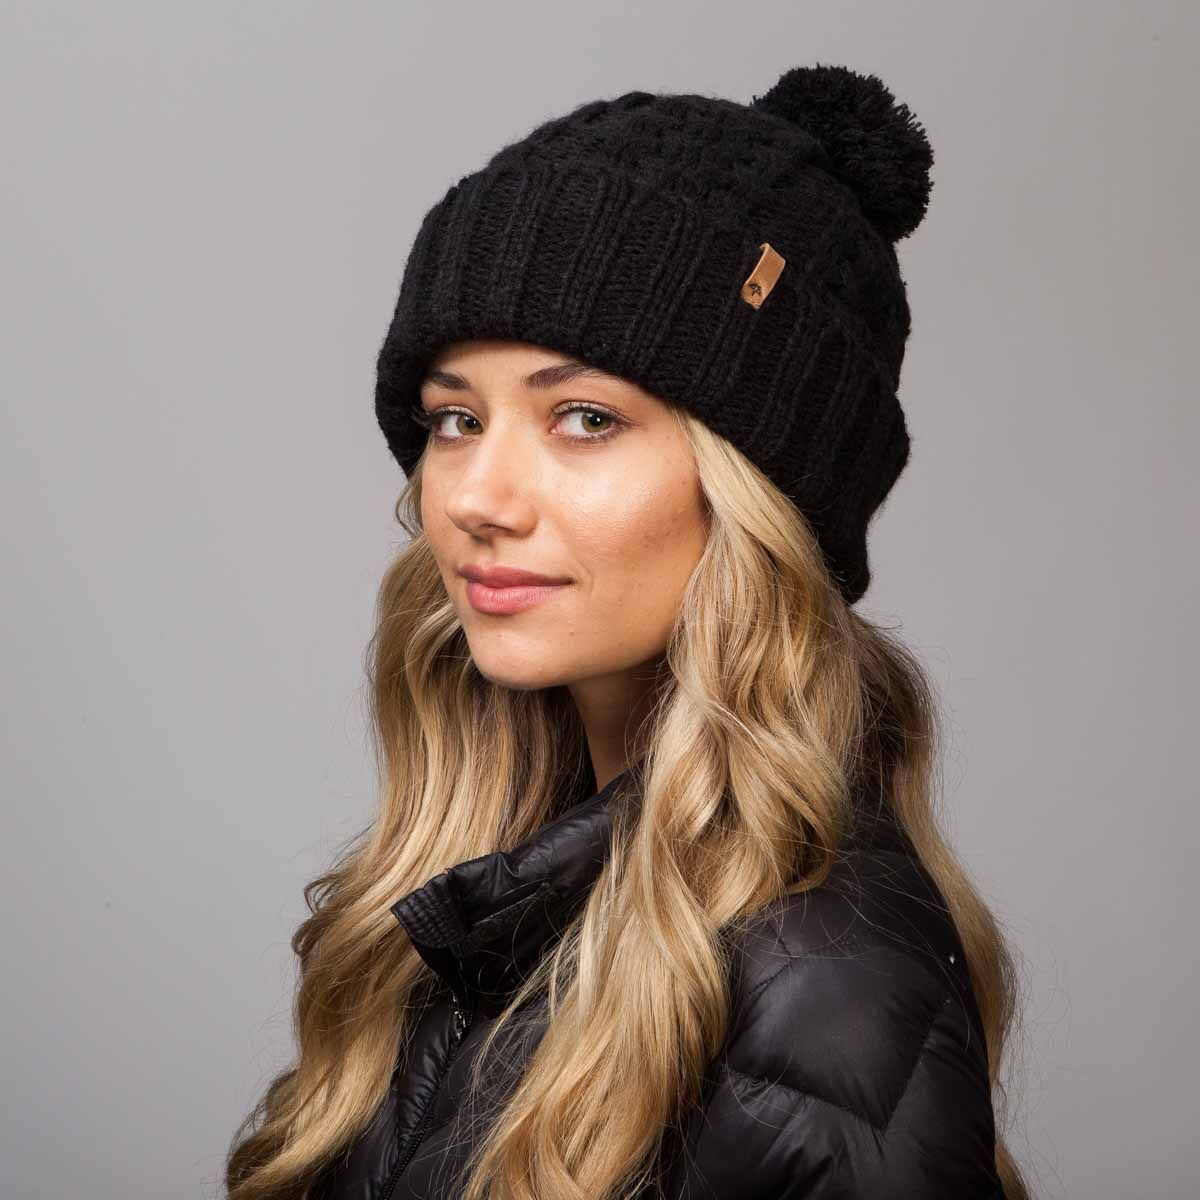 Free shipping and returns on Women's Black Hats at kumau.ml